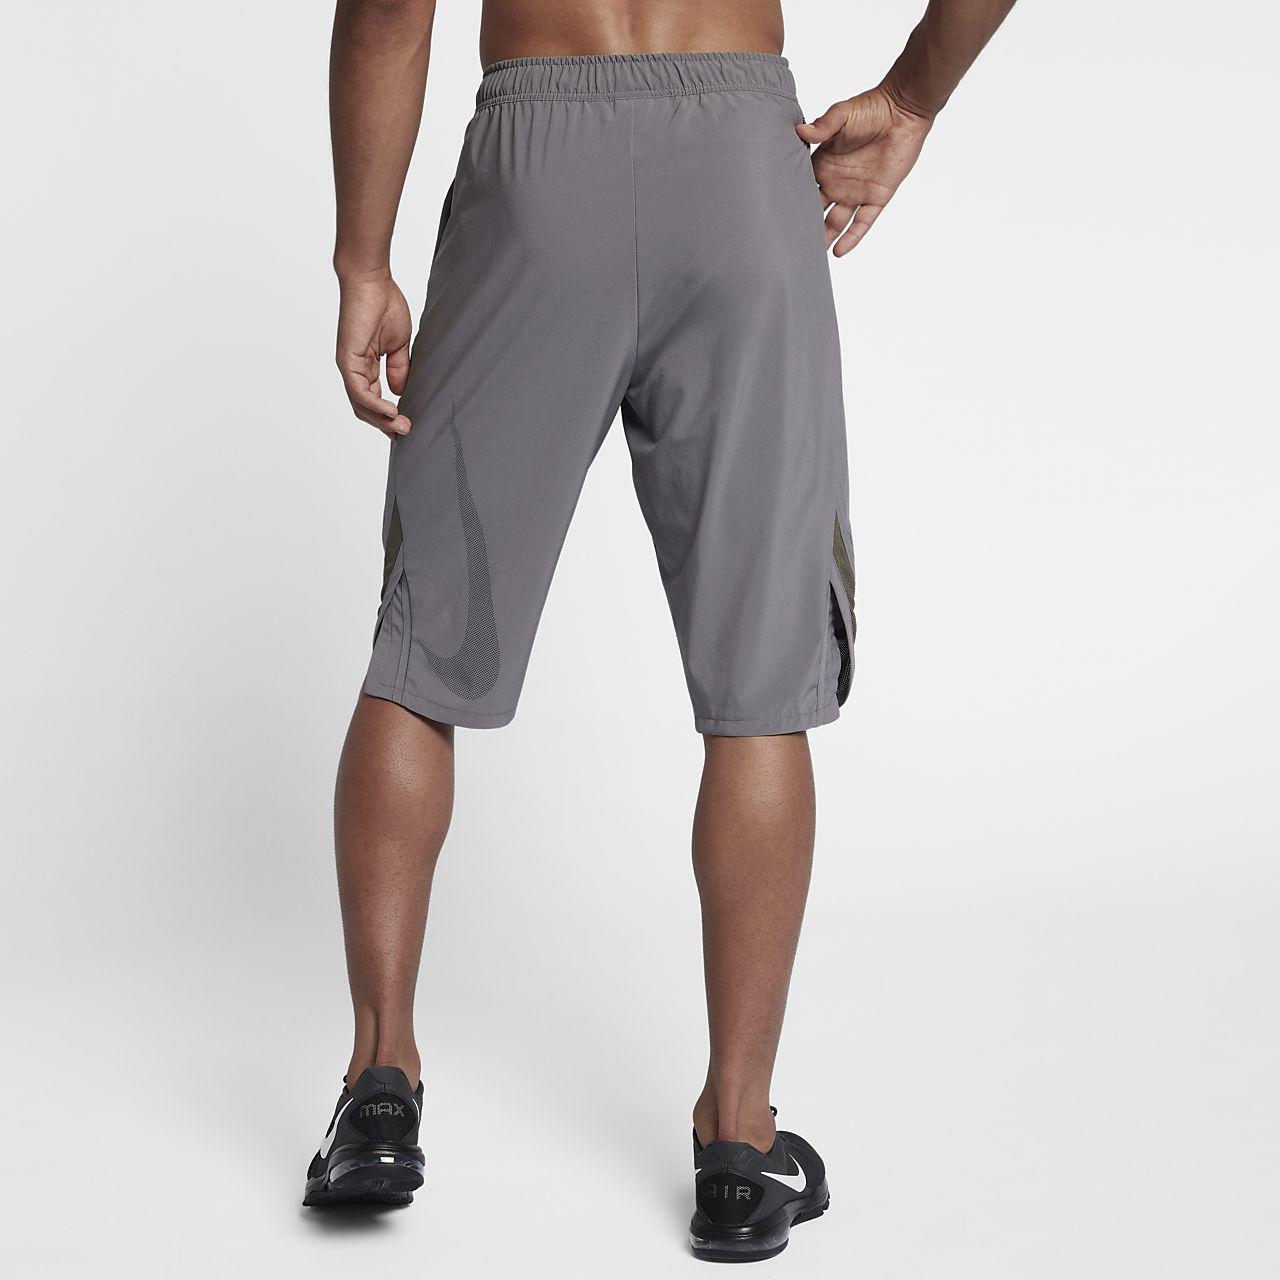 ... Nike Flex Men's Training Shorts